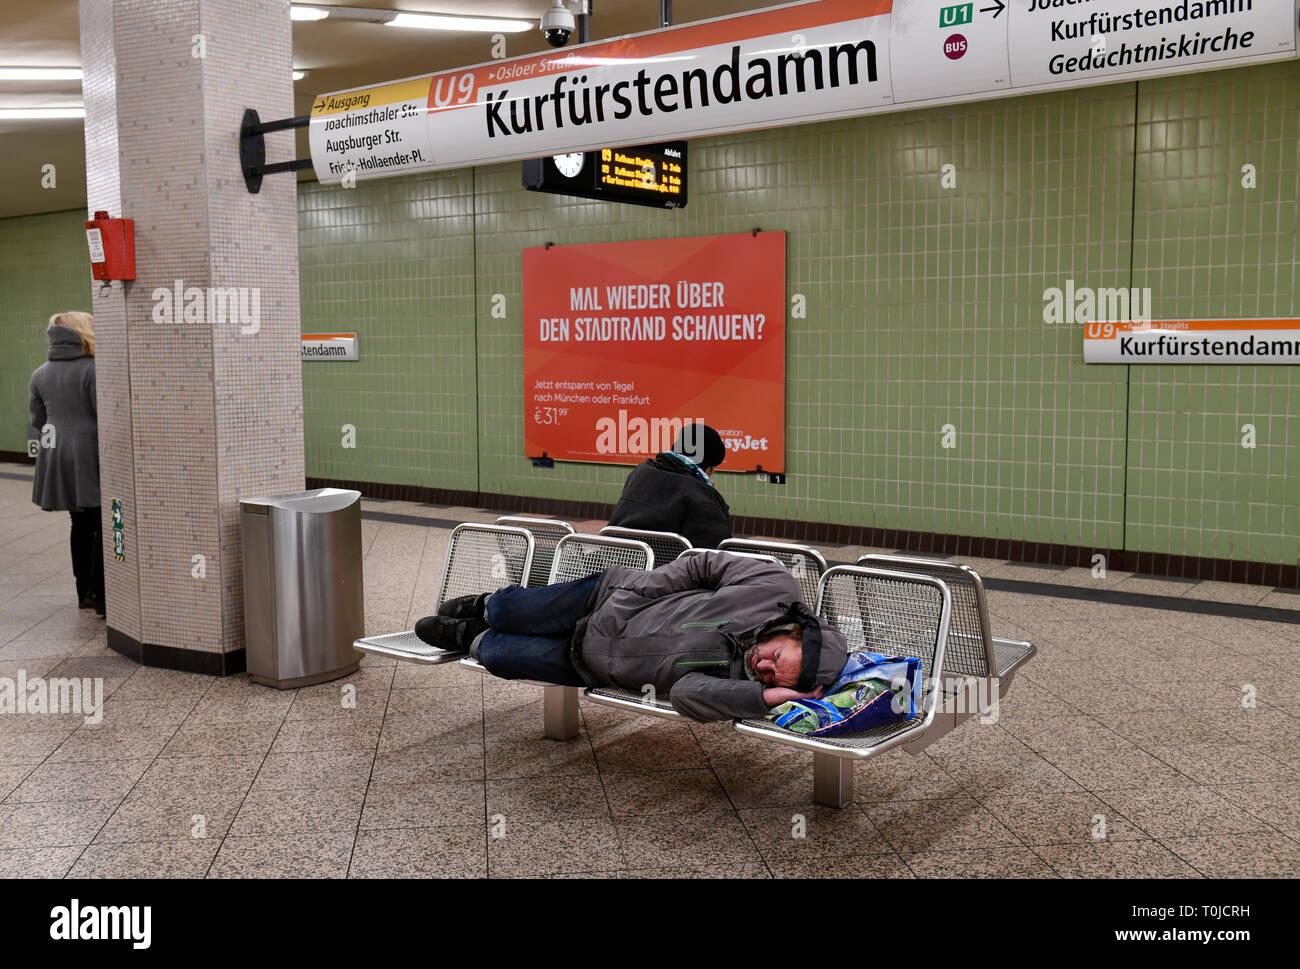 Homeless, subway station, Kurfürstendamm, Charlottenburg, Berlin, Germany, Obdachloser, U-Bahnhof, Deutschland - Stock Image